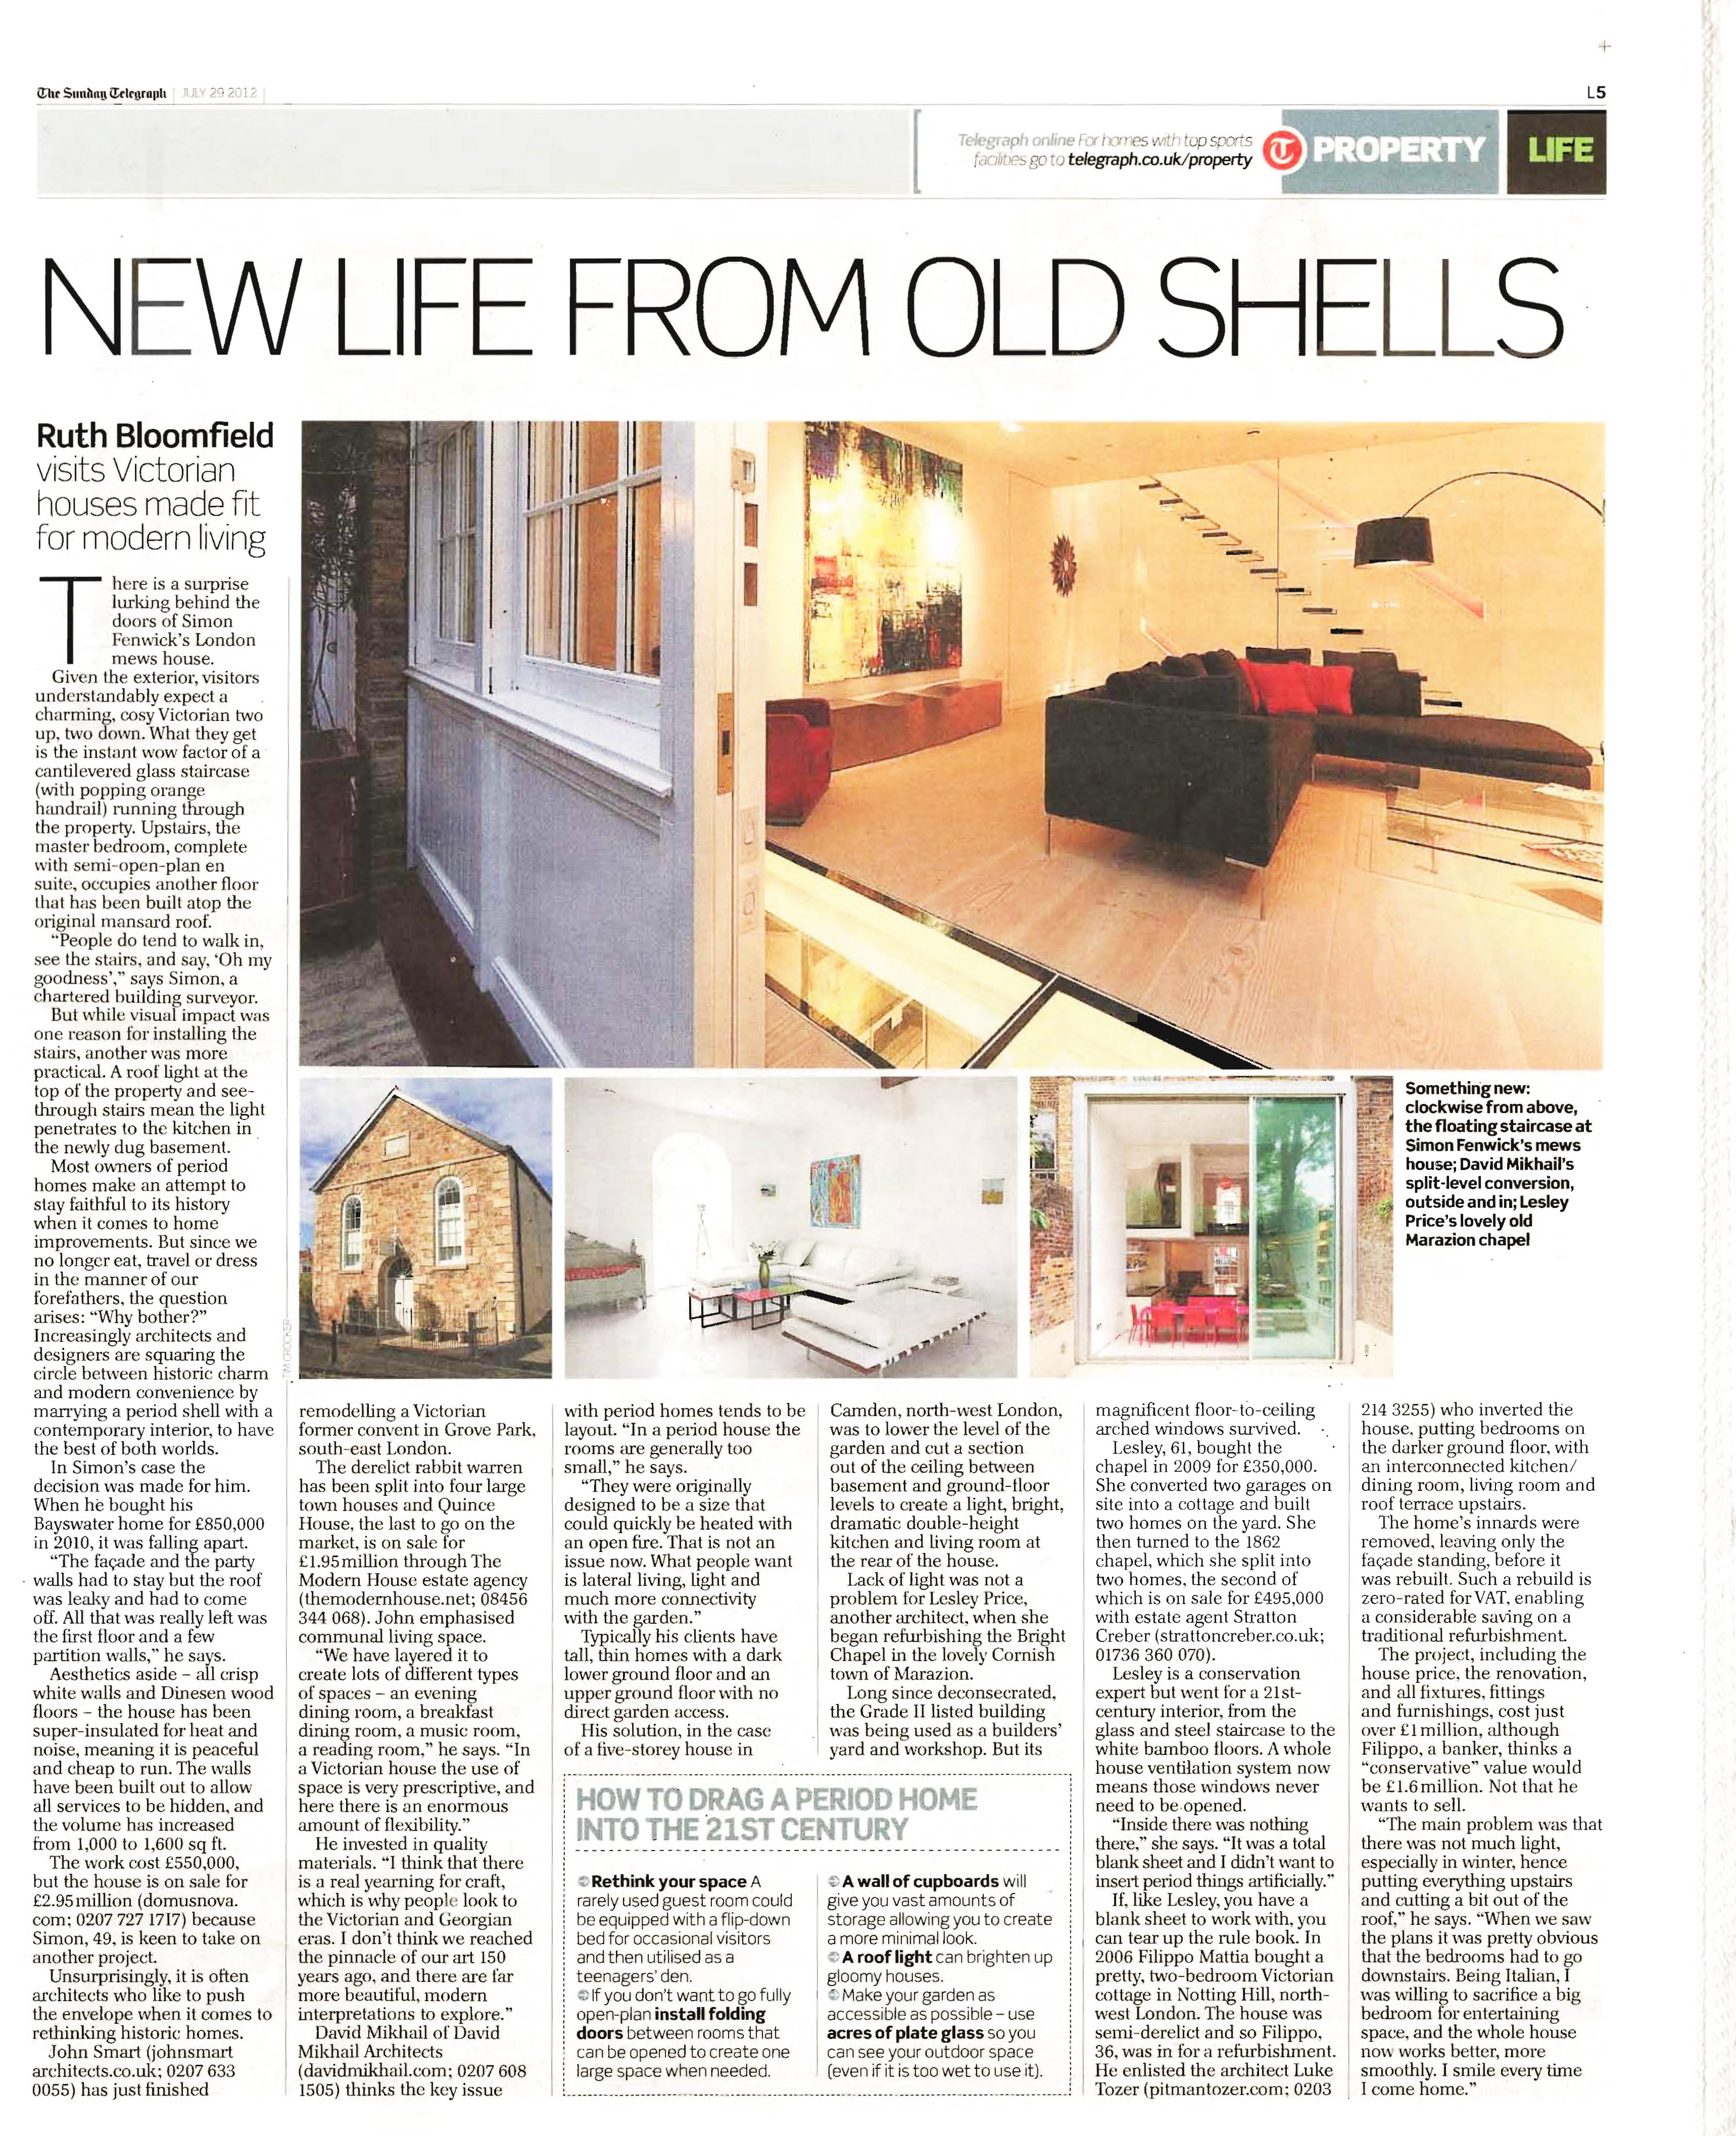 Sunday_Telegraph_Life_290712-1